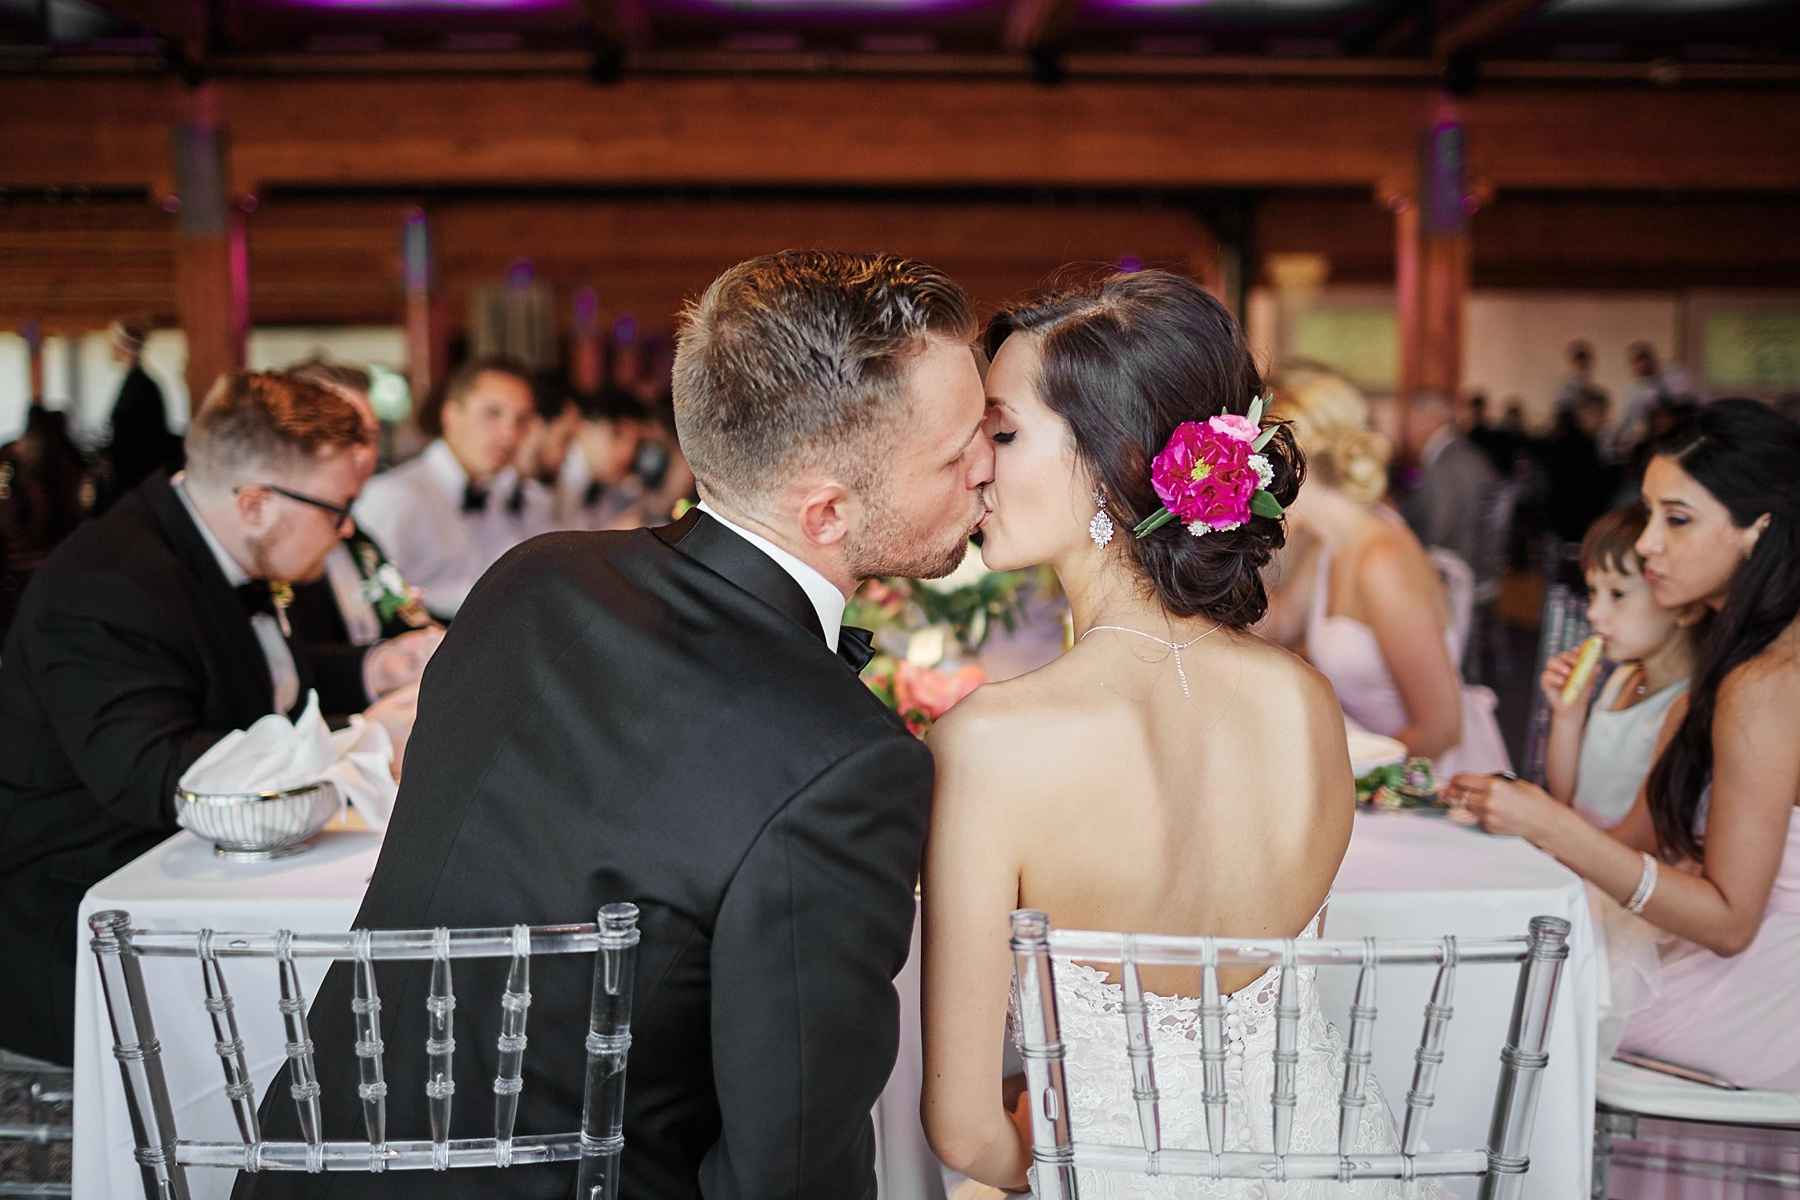 ABULAE-Wedding-Saint-paul-MN-Josh-Sofia-Wedding-Mears-Park_0811.jpg